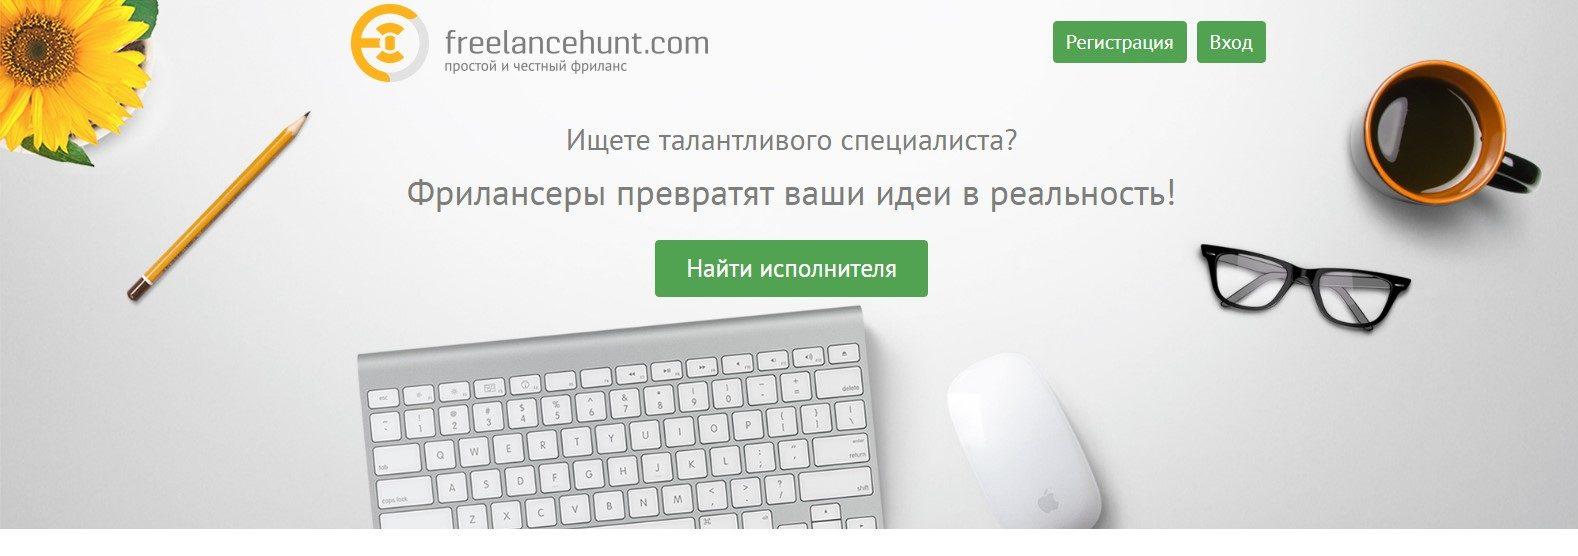 Вакансии фрилансеров в беларуси сайт фриланс программисты